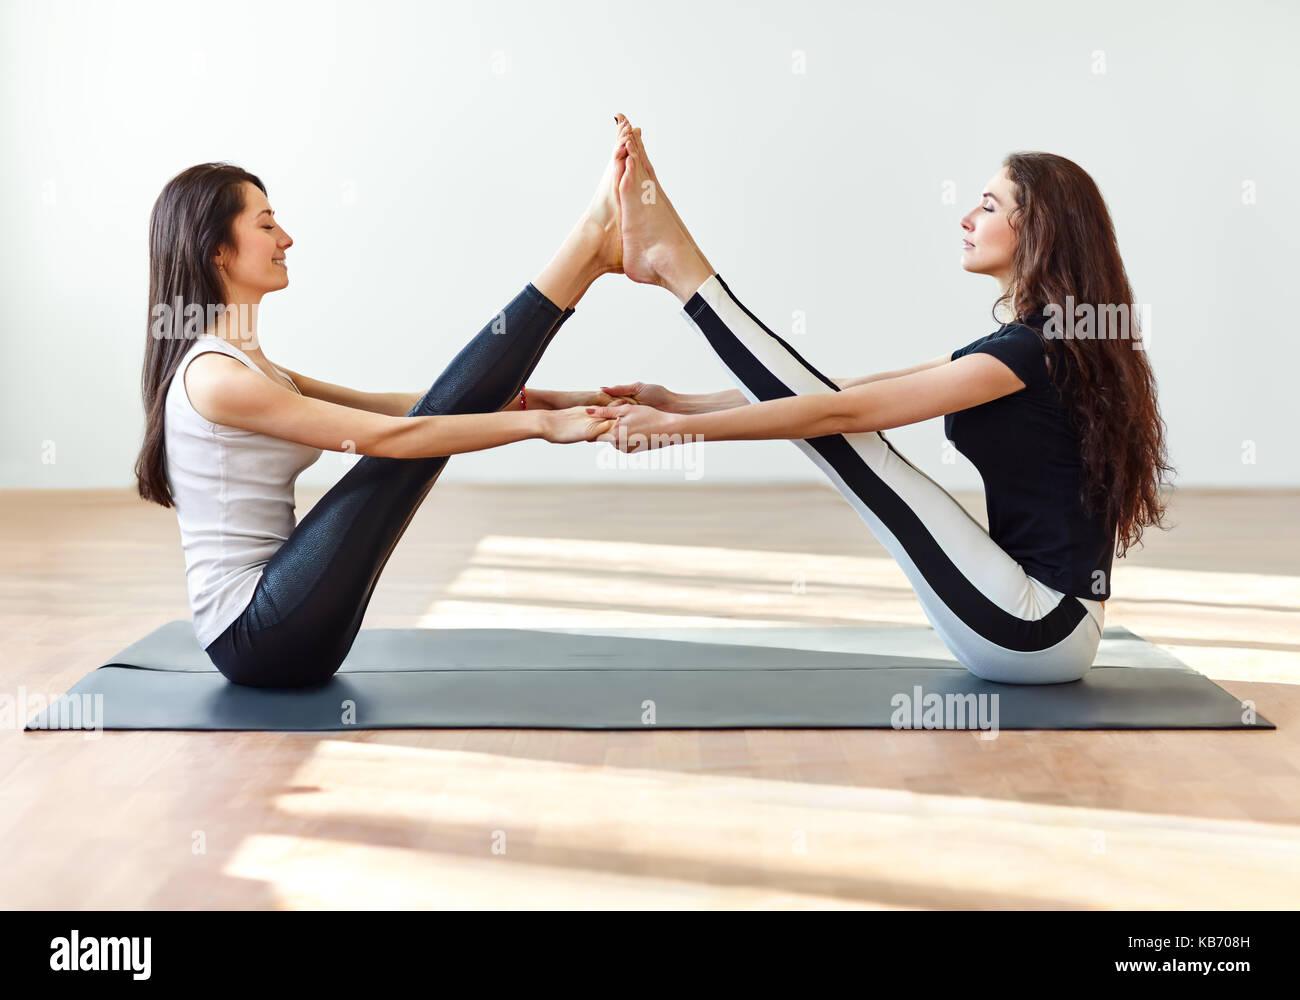 Zwei junge Frauen Yoga Asana buddy Boot dar. Paripurna Navasana ...